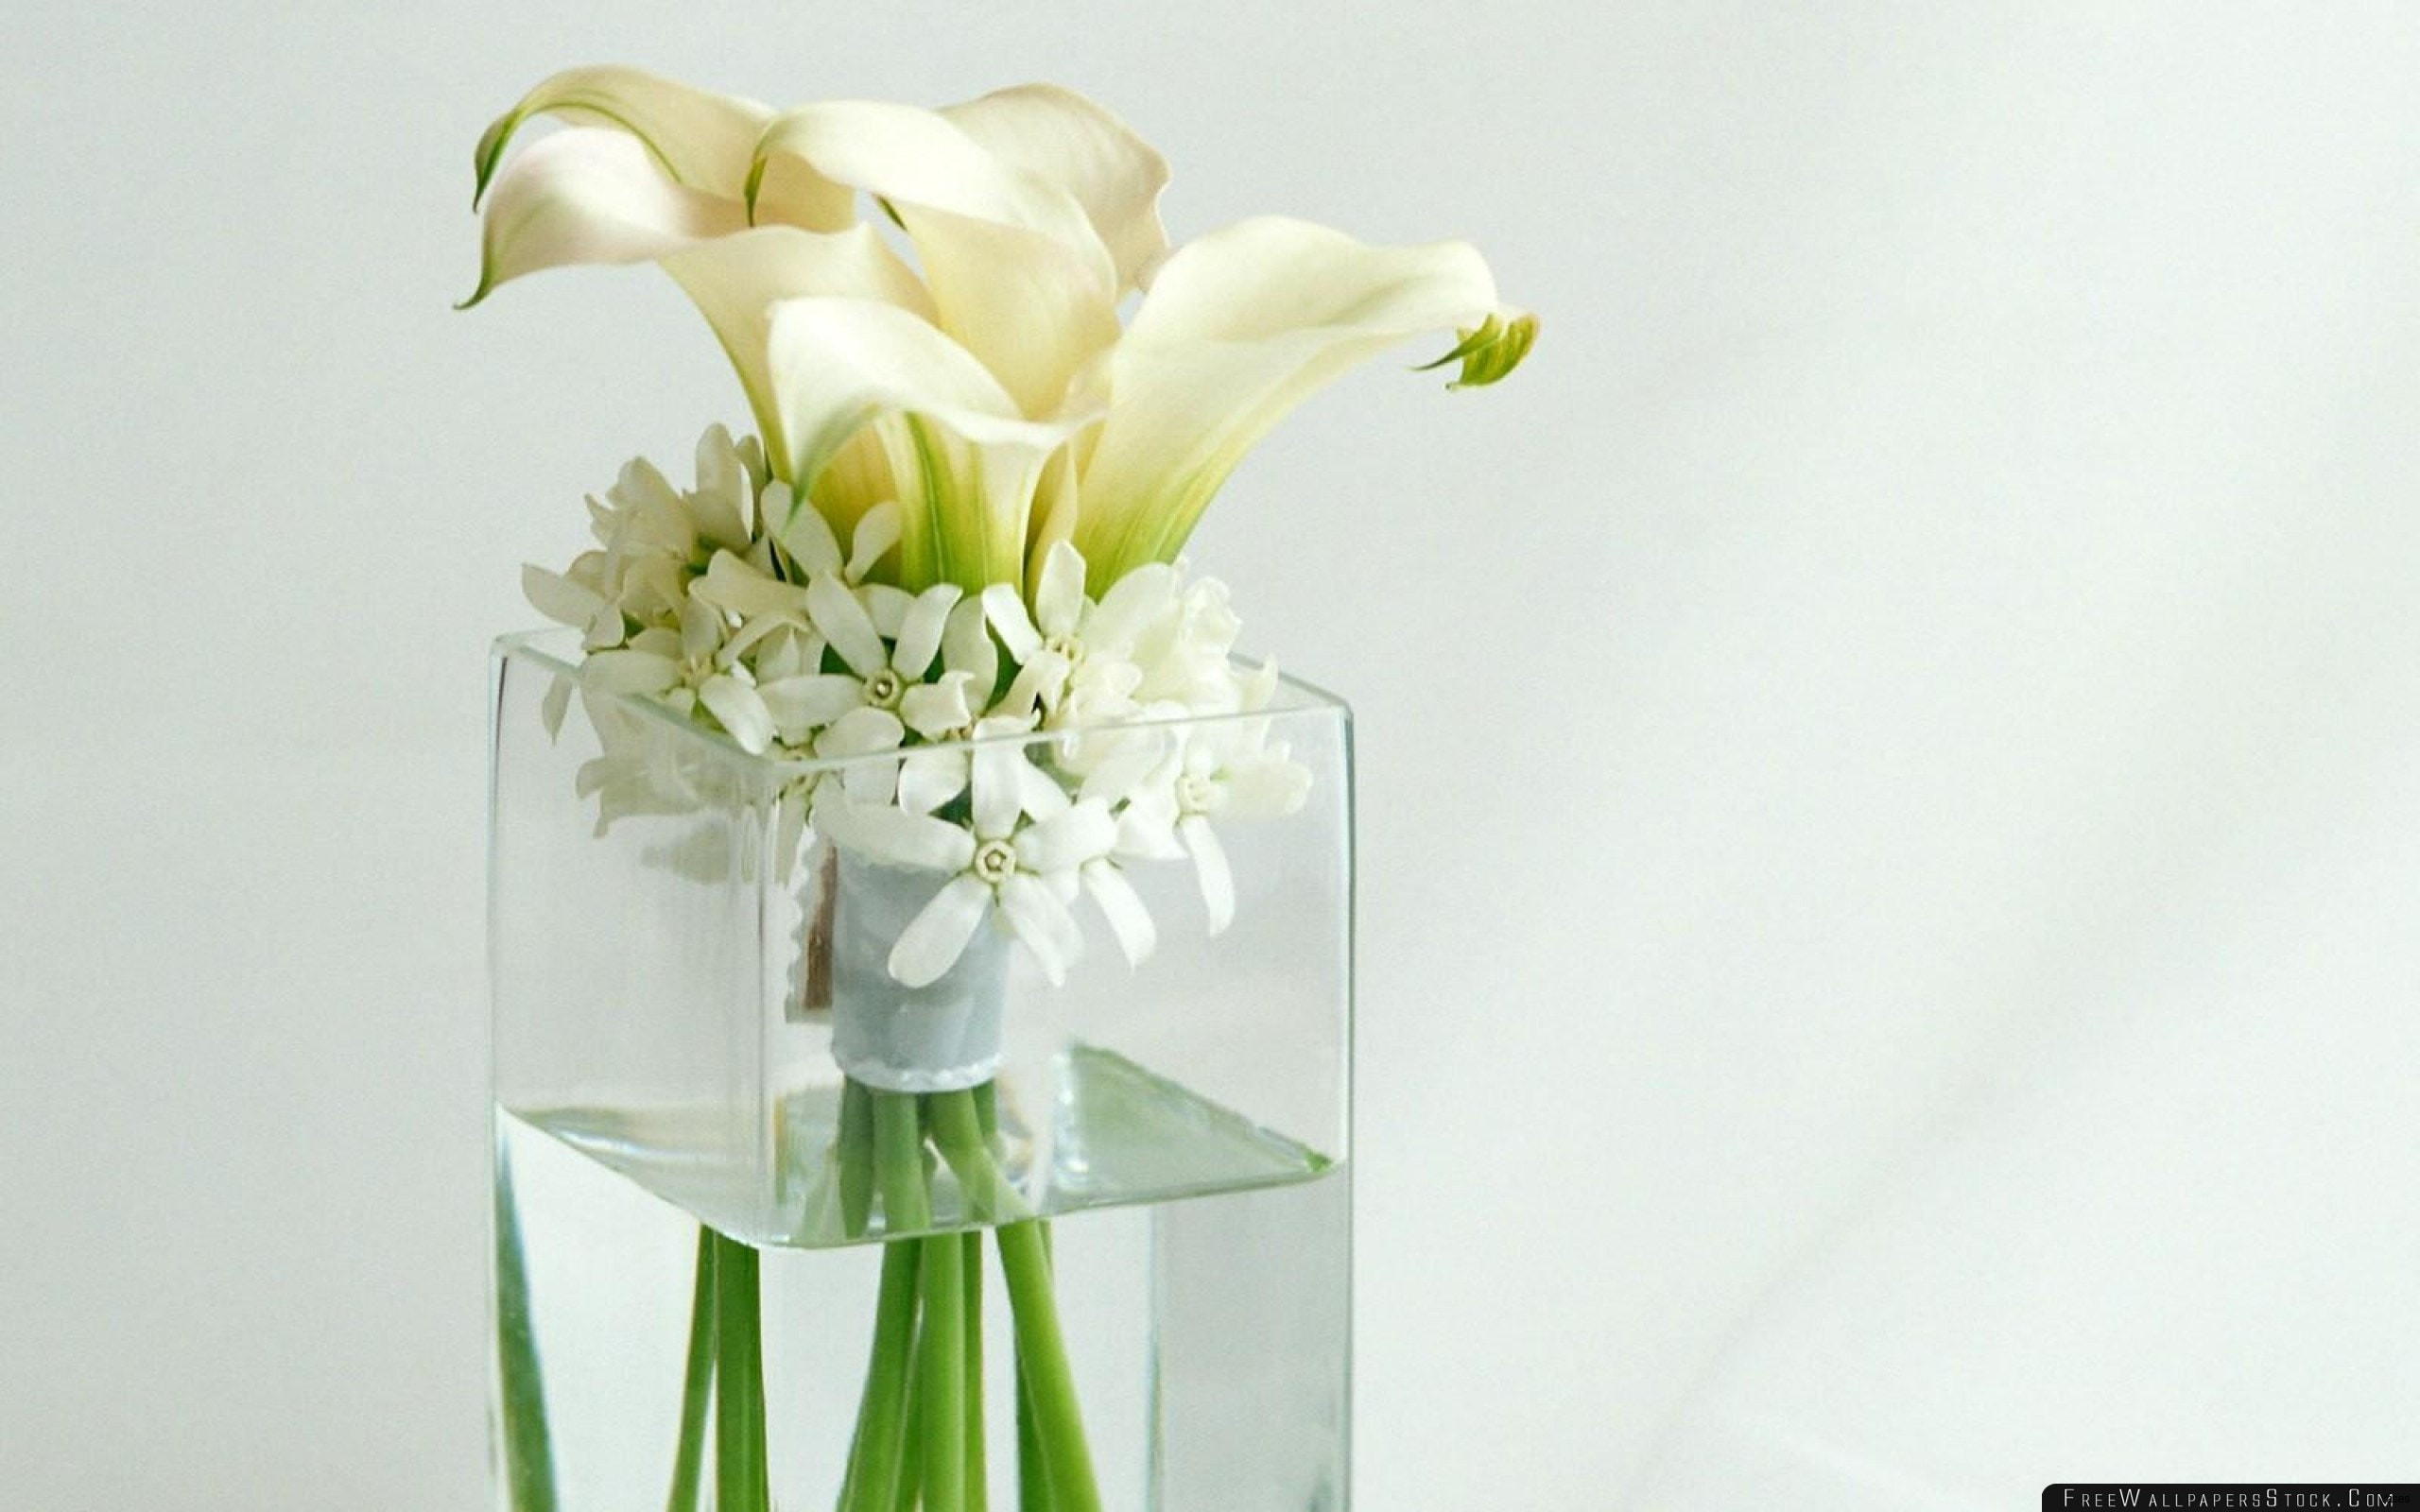 Baby Shower Center Piece Ideas Tall Vase Centerpiece Ideas Vases Flowers In Water 0d Artificial